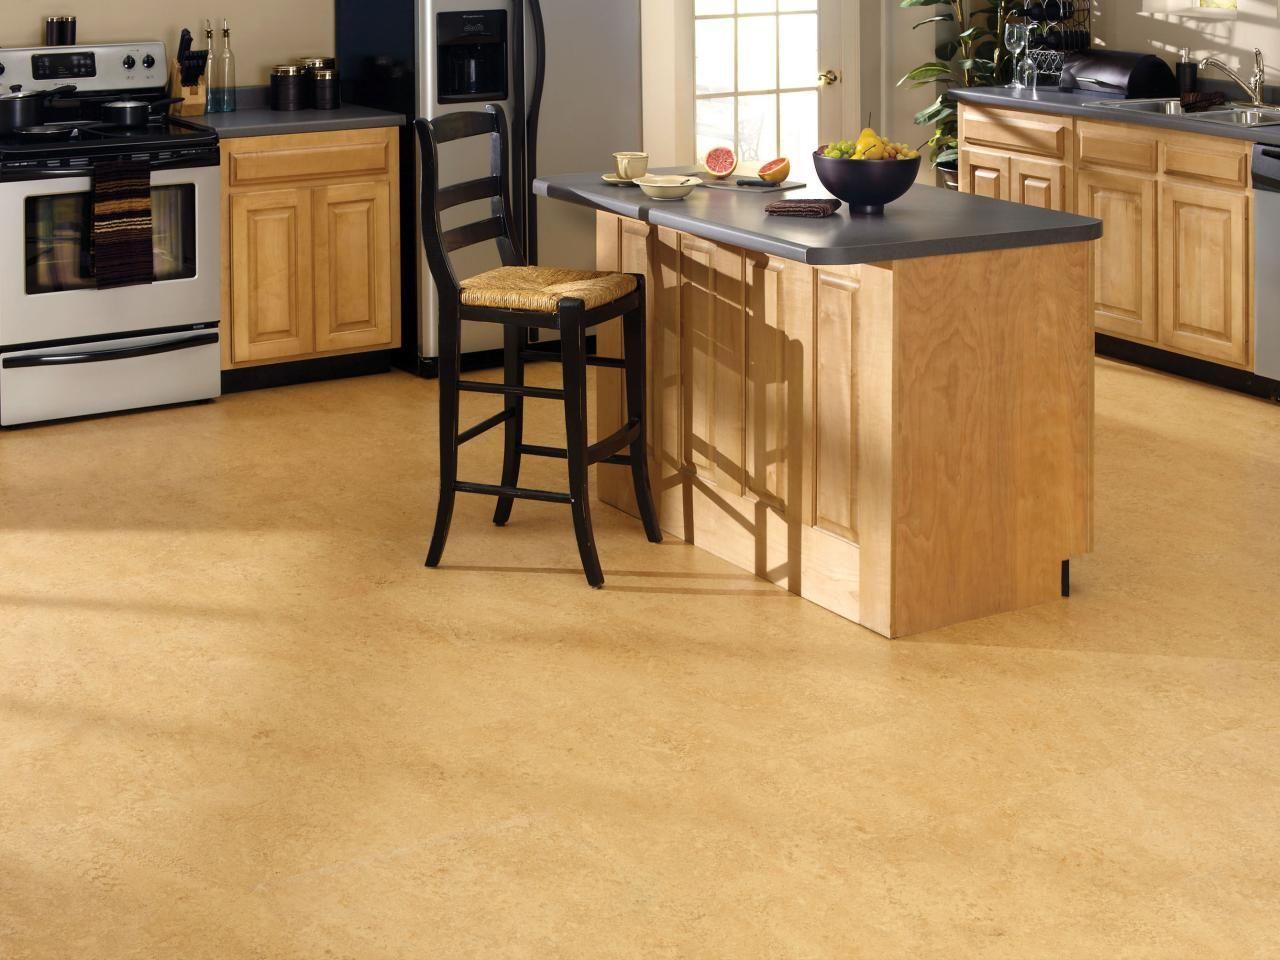 flooring trends kitchen vinyl flooring ideas and diy network on kitchen flooring ideas id=96196